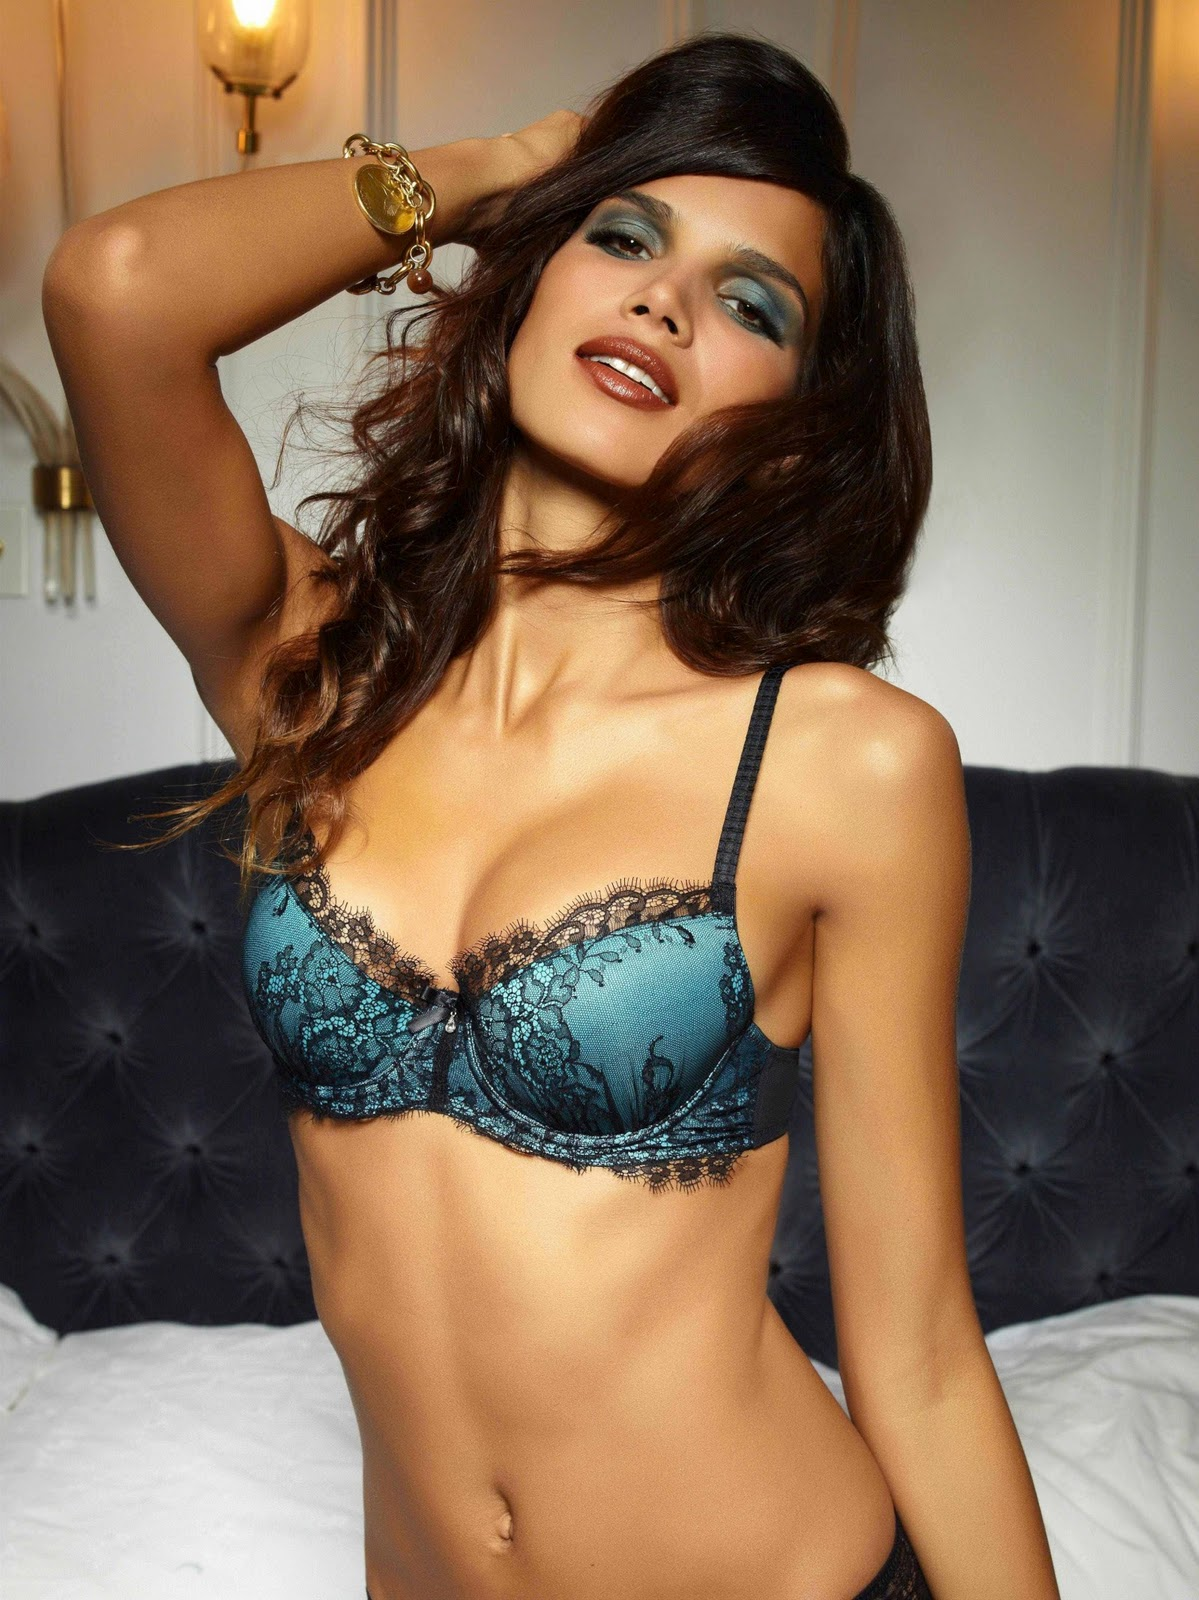 Cleavage Raica Oliveira nude (26 photo), Tits, Paparazzi, Boobs, braless 2015